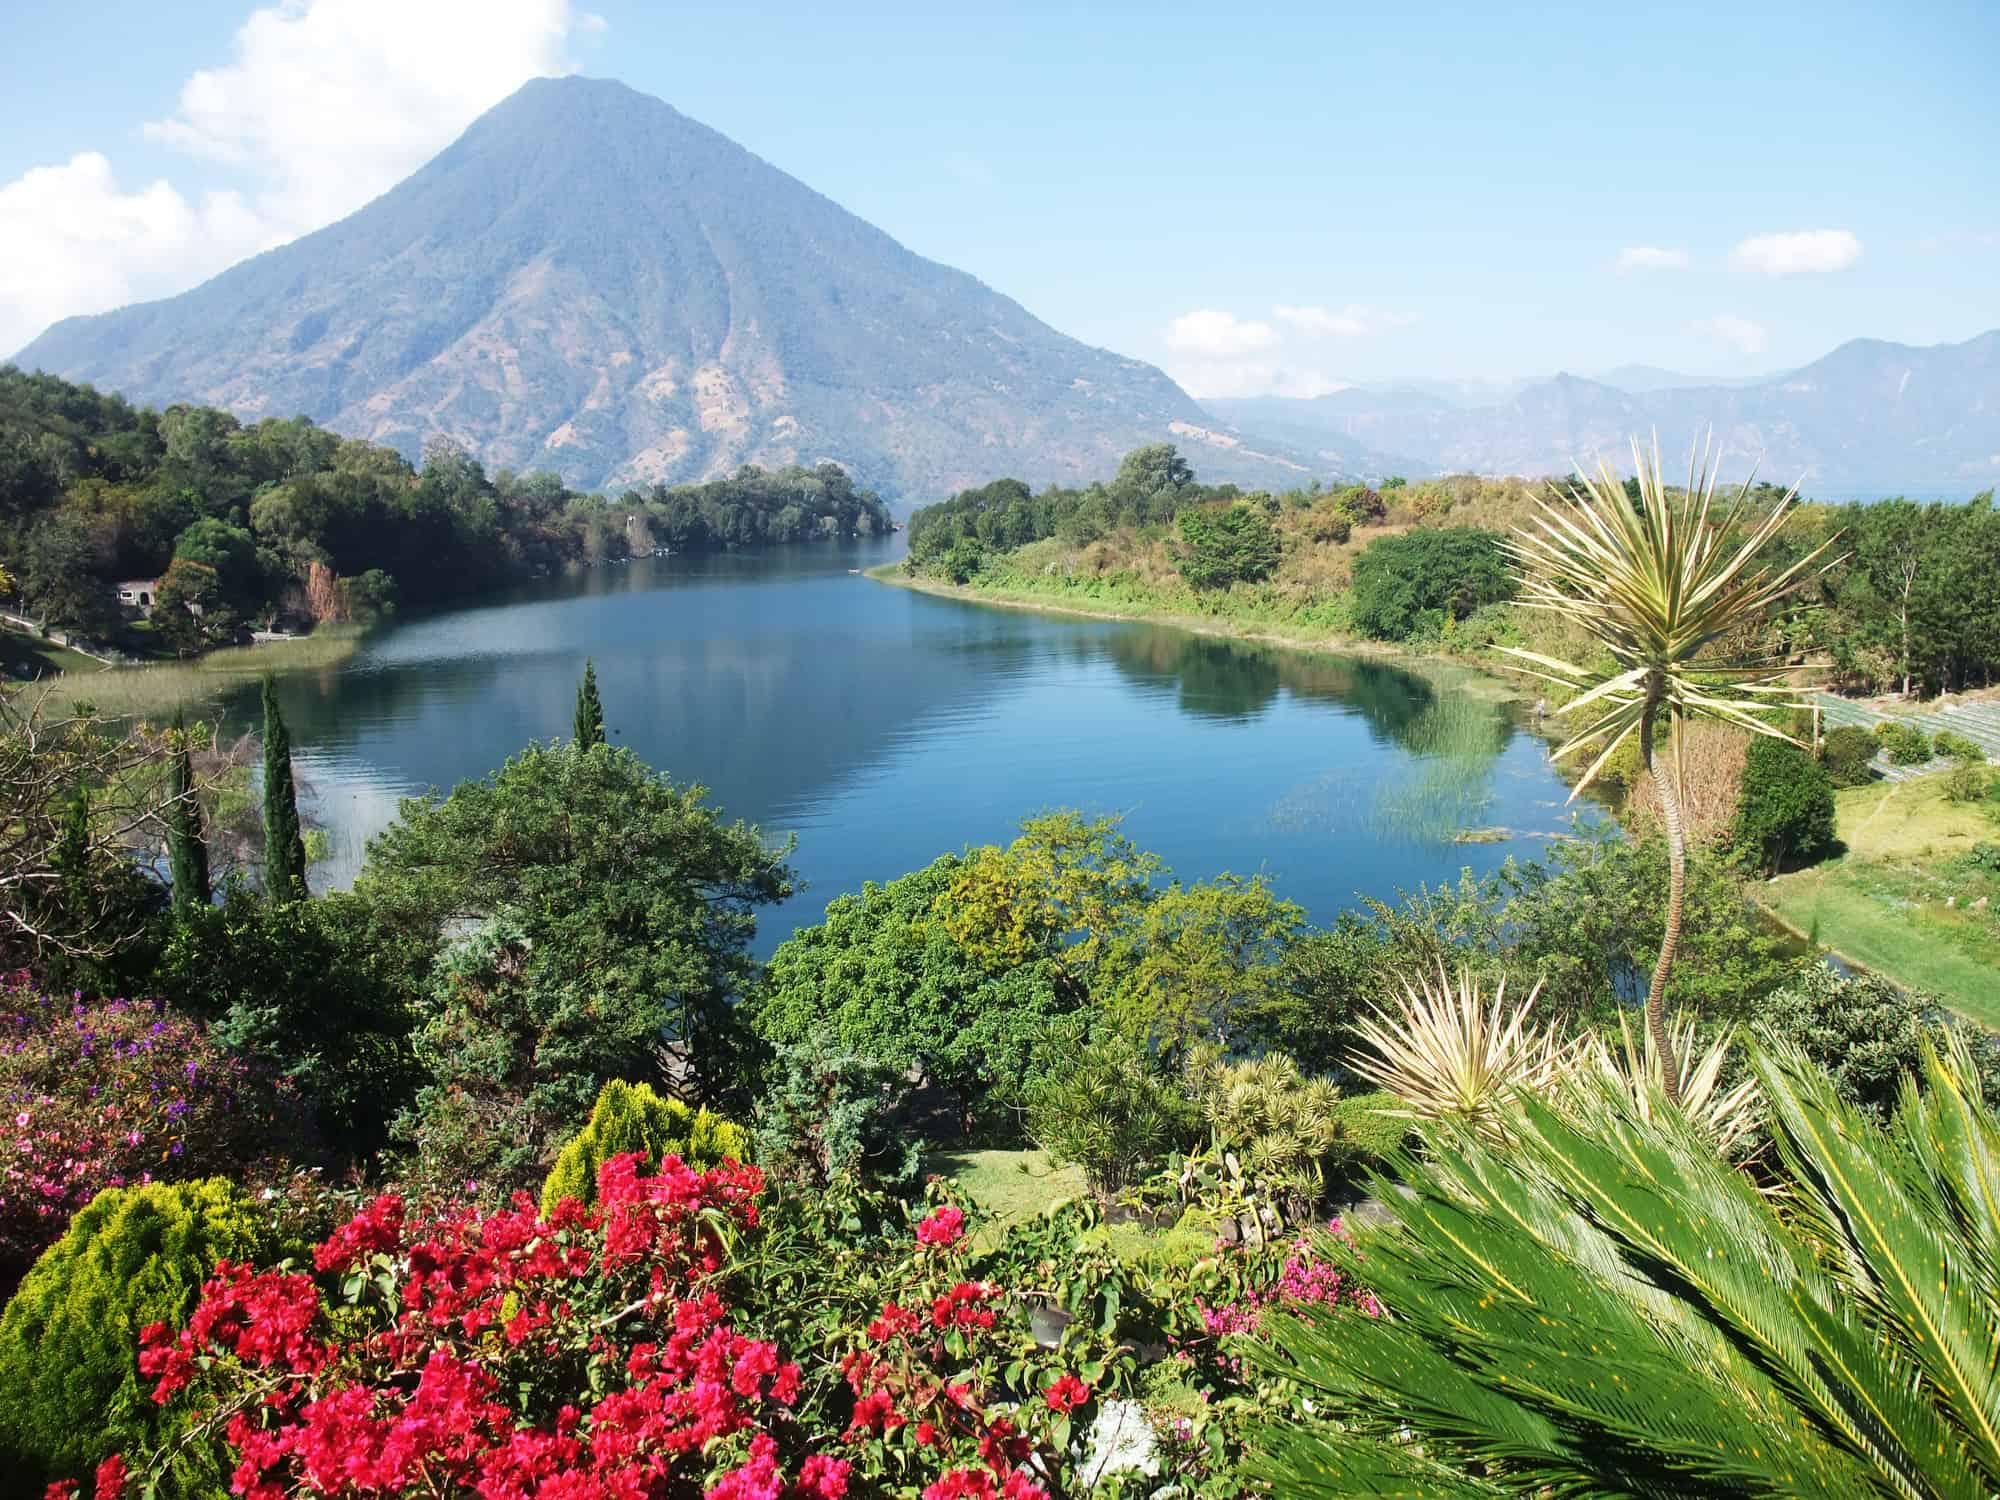 Lake Atitlan in the Guatemala highlands